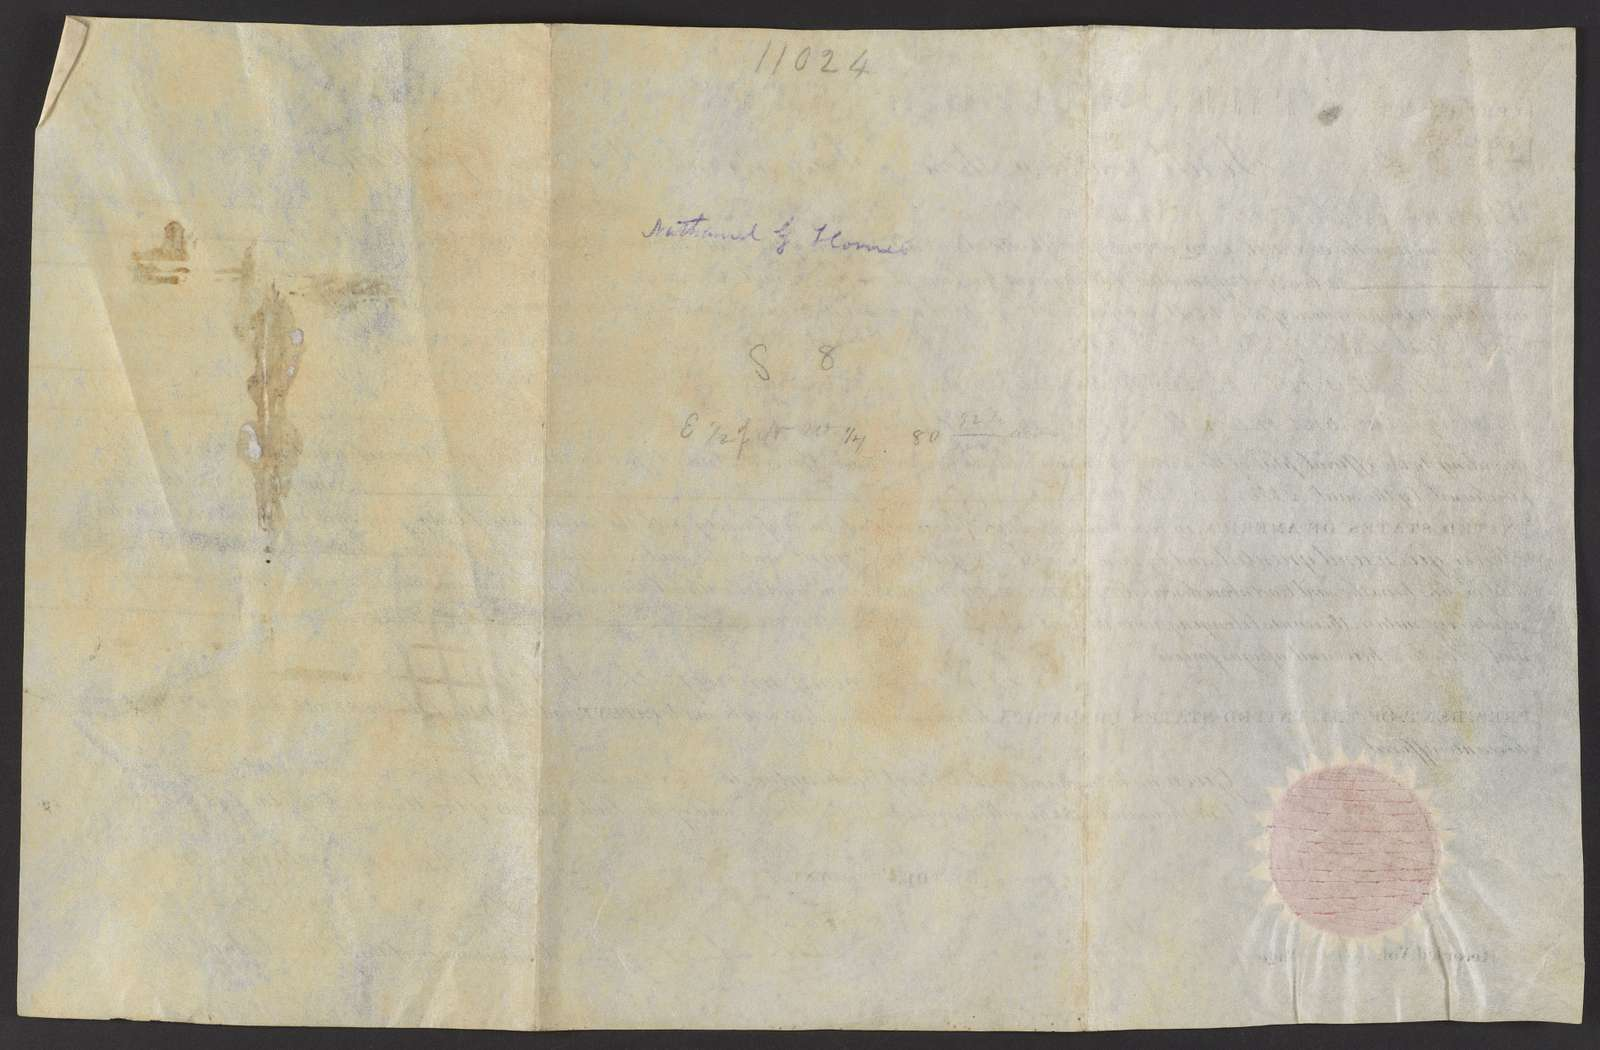 Deeds for land in Alabama, 1833-1834